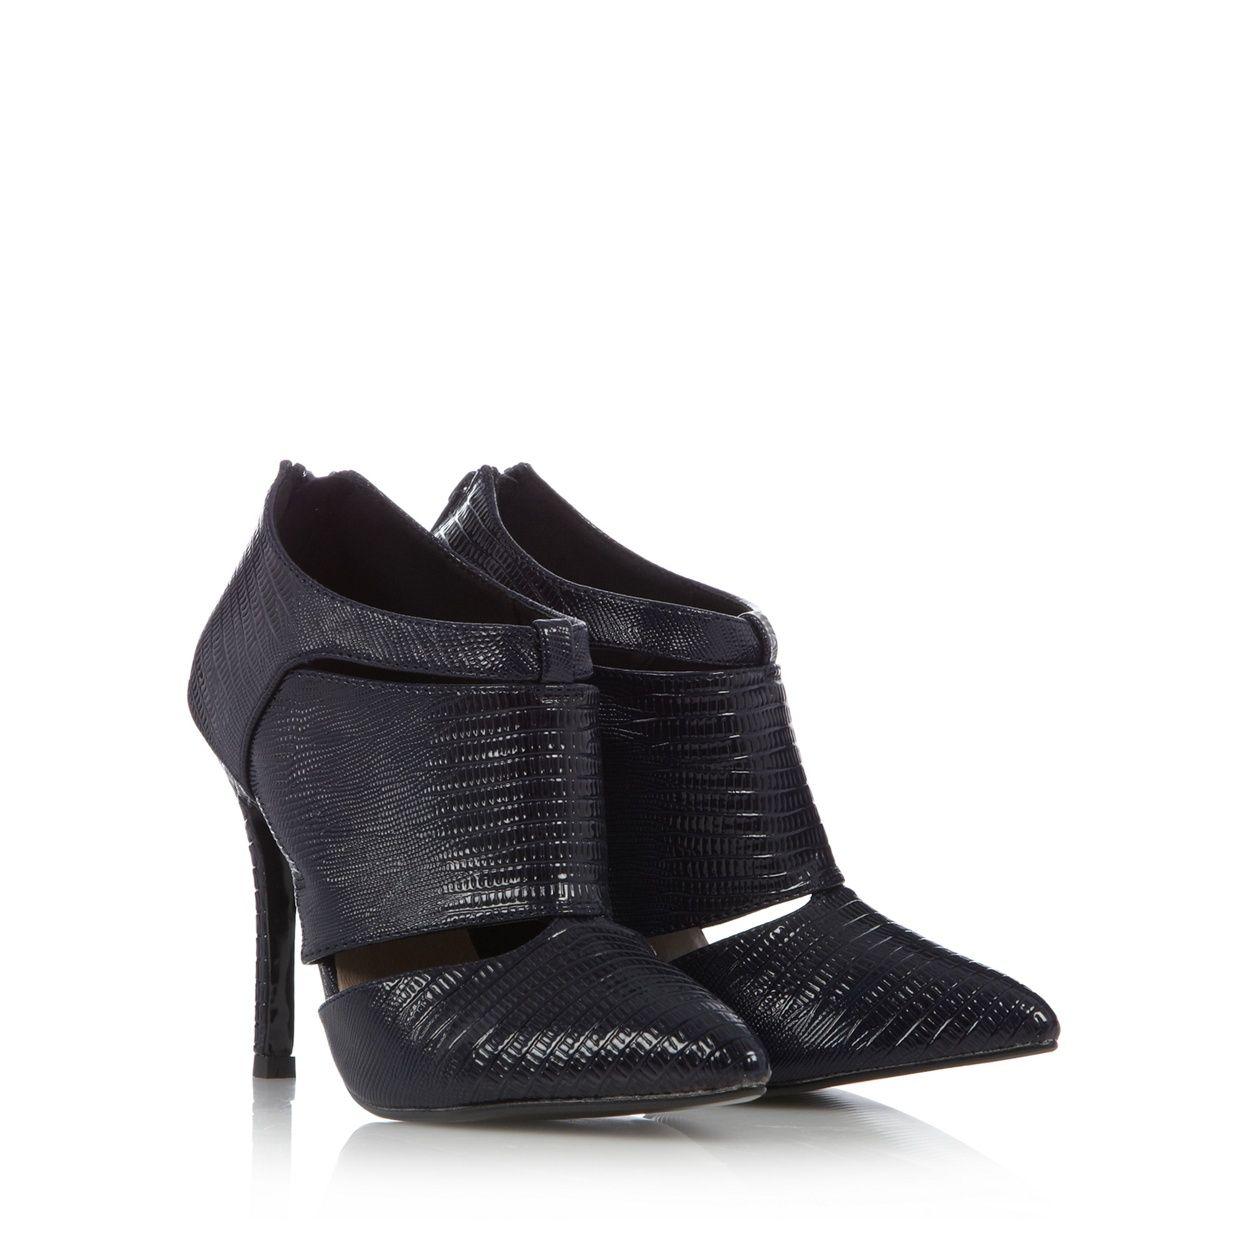 Black sandals debenhams - Faith Navy Lizard Effect Patent High Court Shoes At Debenhams Com